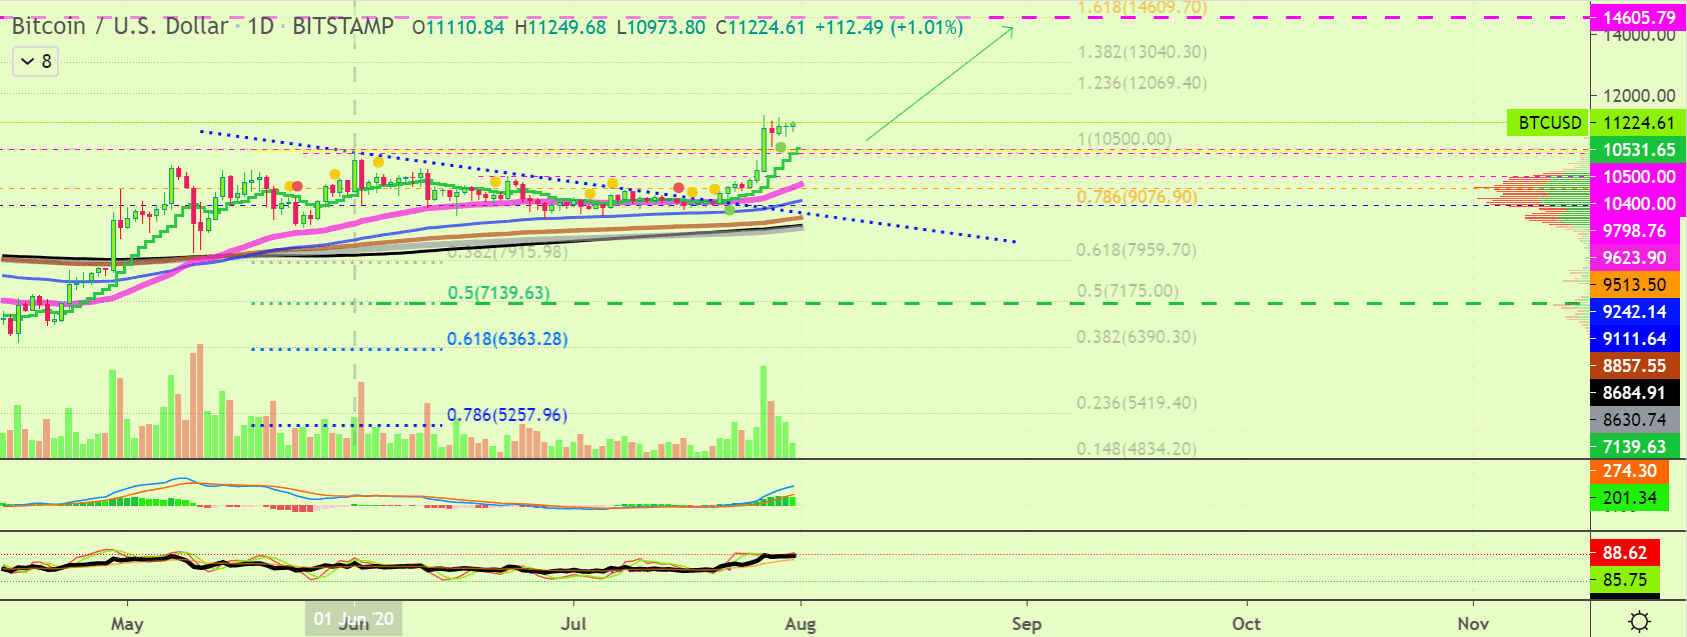 Bitcoin price chart 2 - 31 July